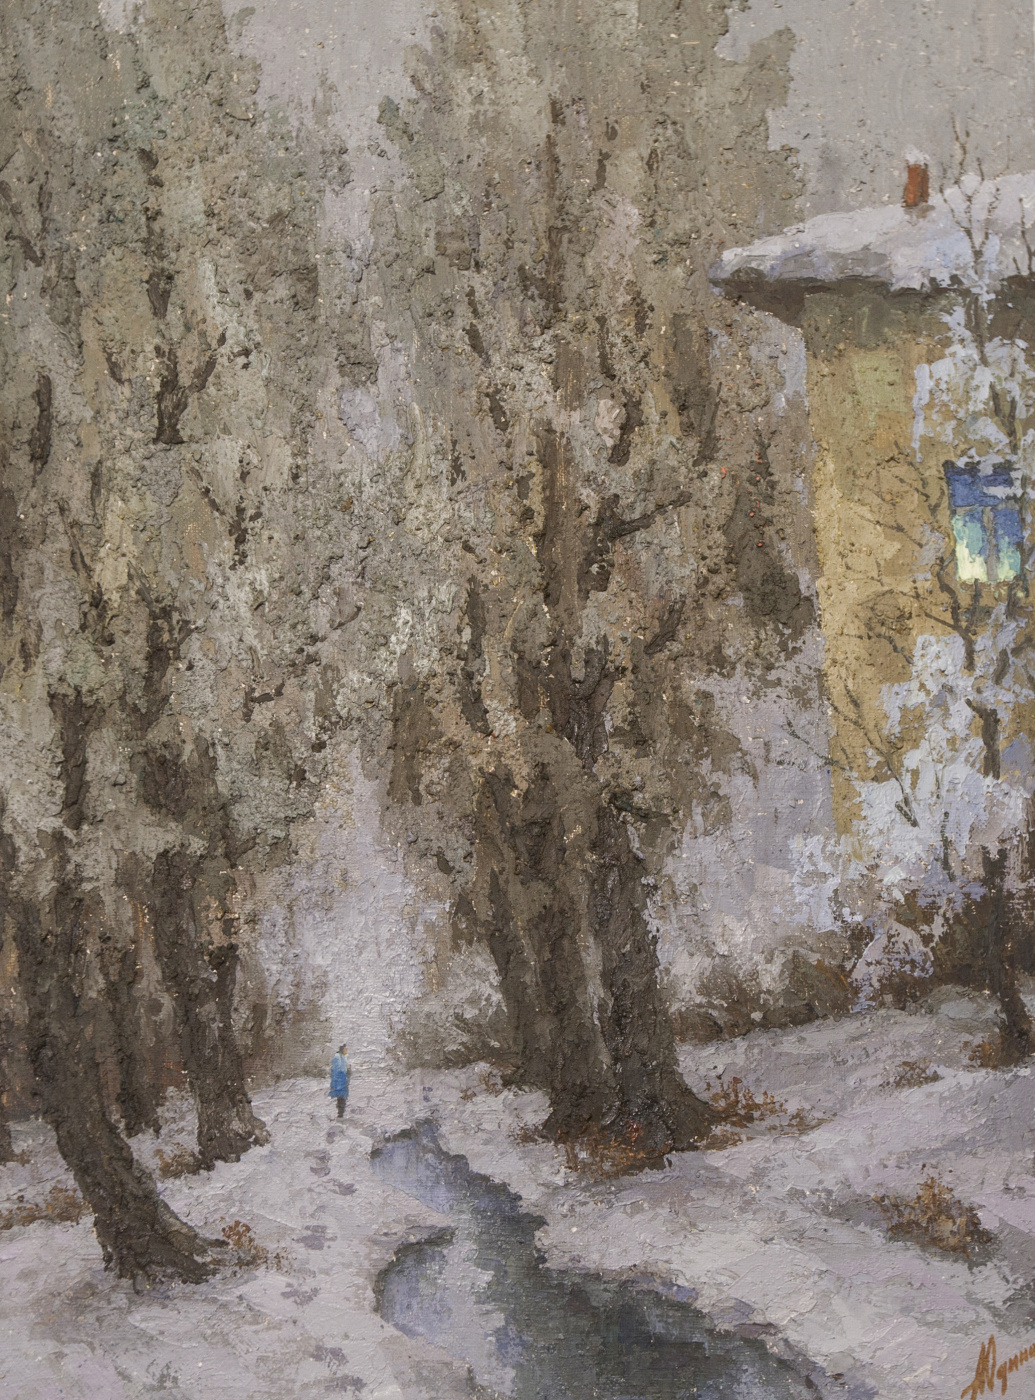 Alexander Vasilievich Yudintsev. First snow